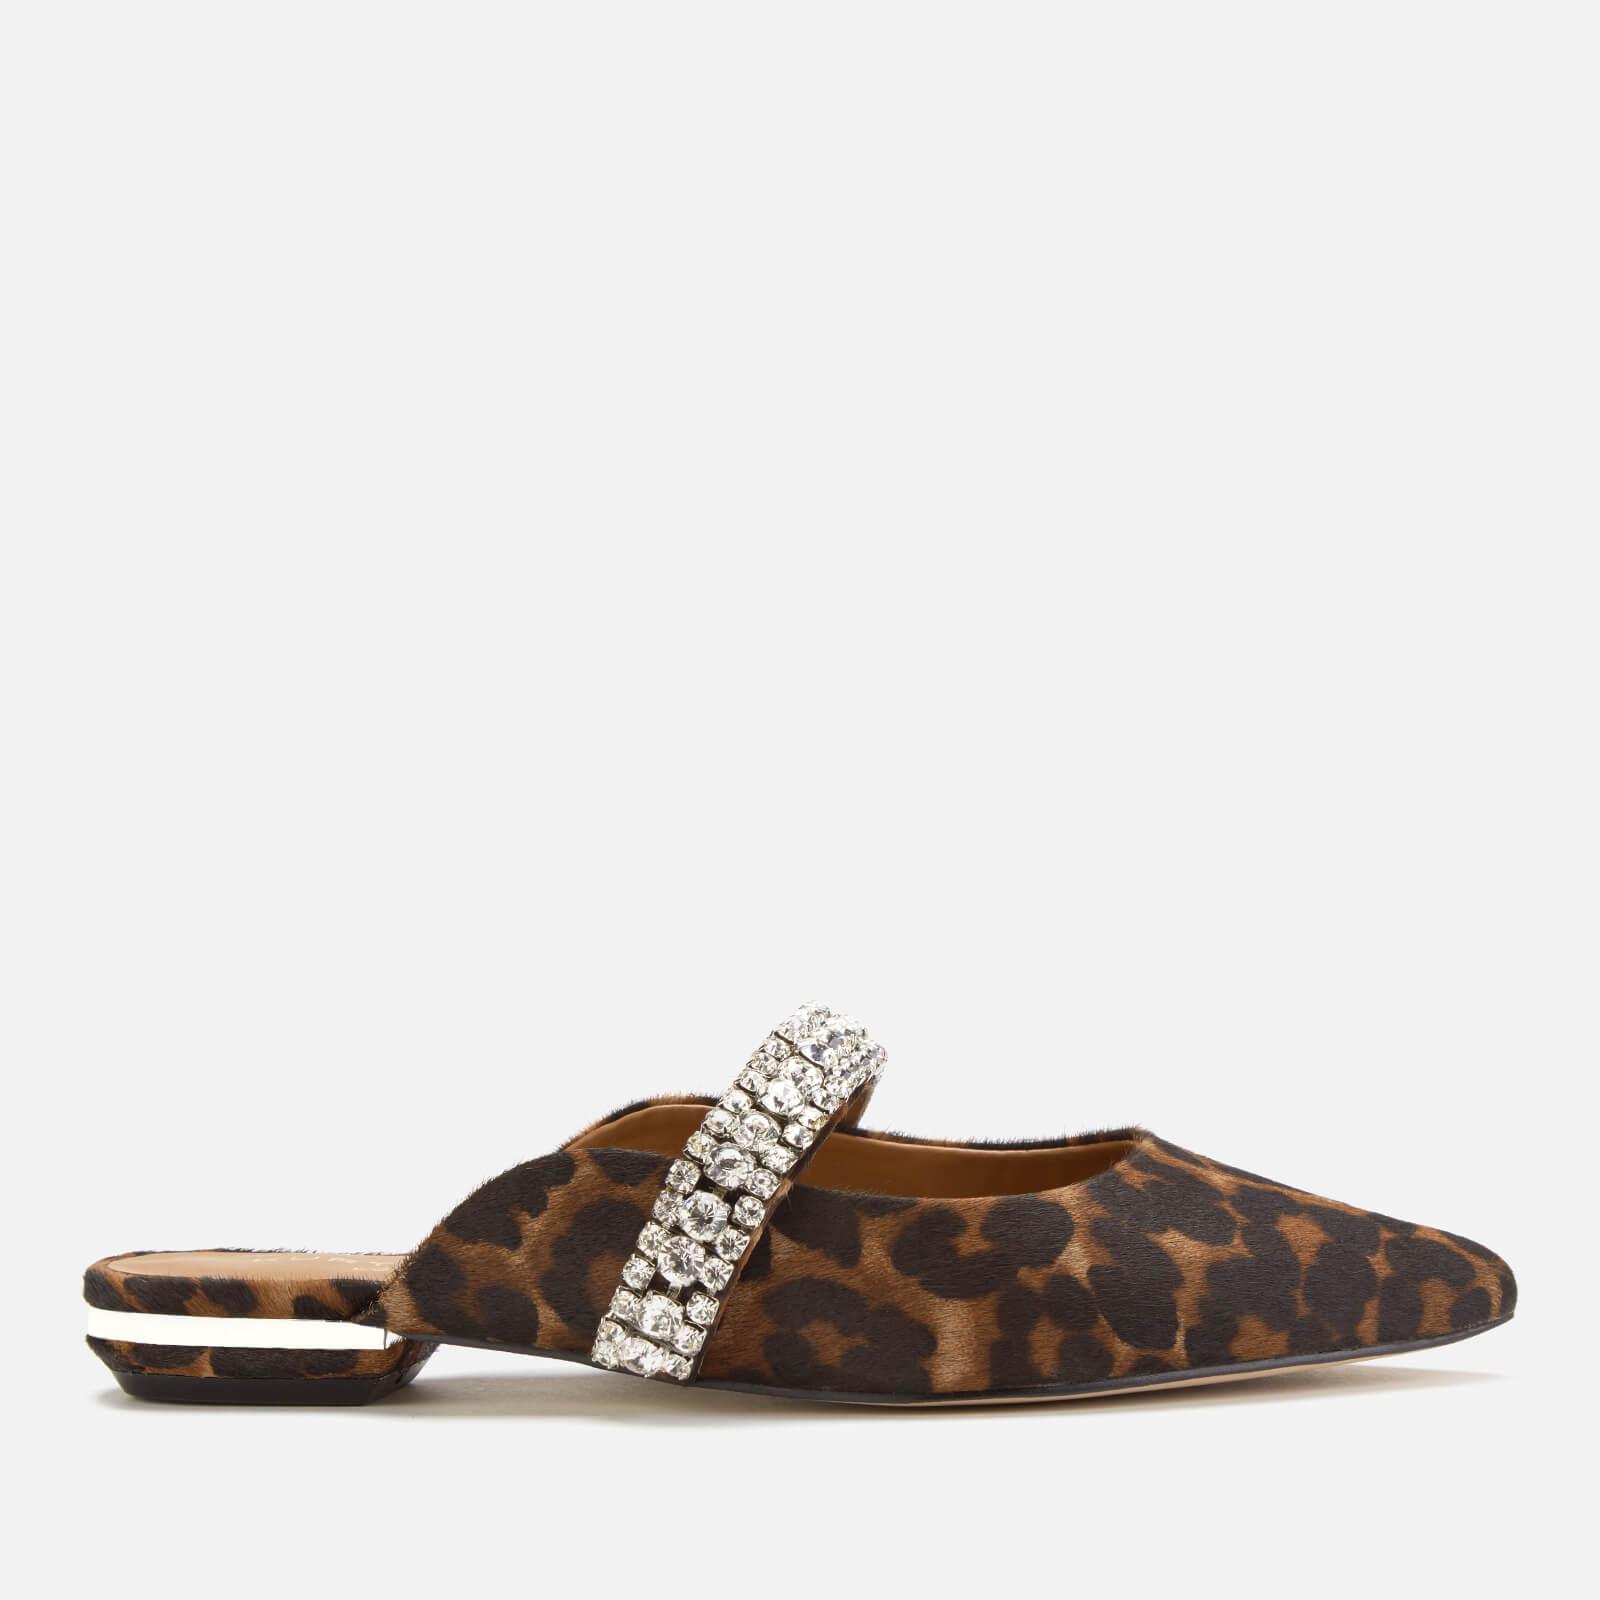 Kurt Geiger London Women's Princely Flat Mules - Cream Comb - UK 6 - Tan